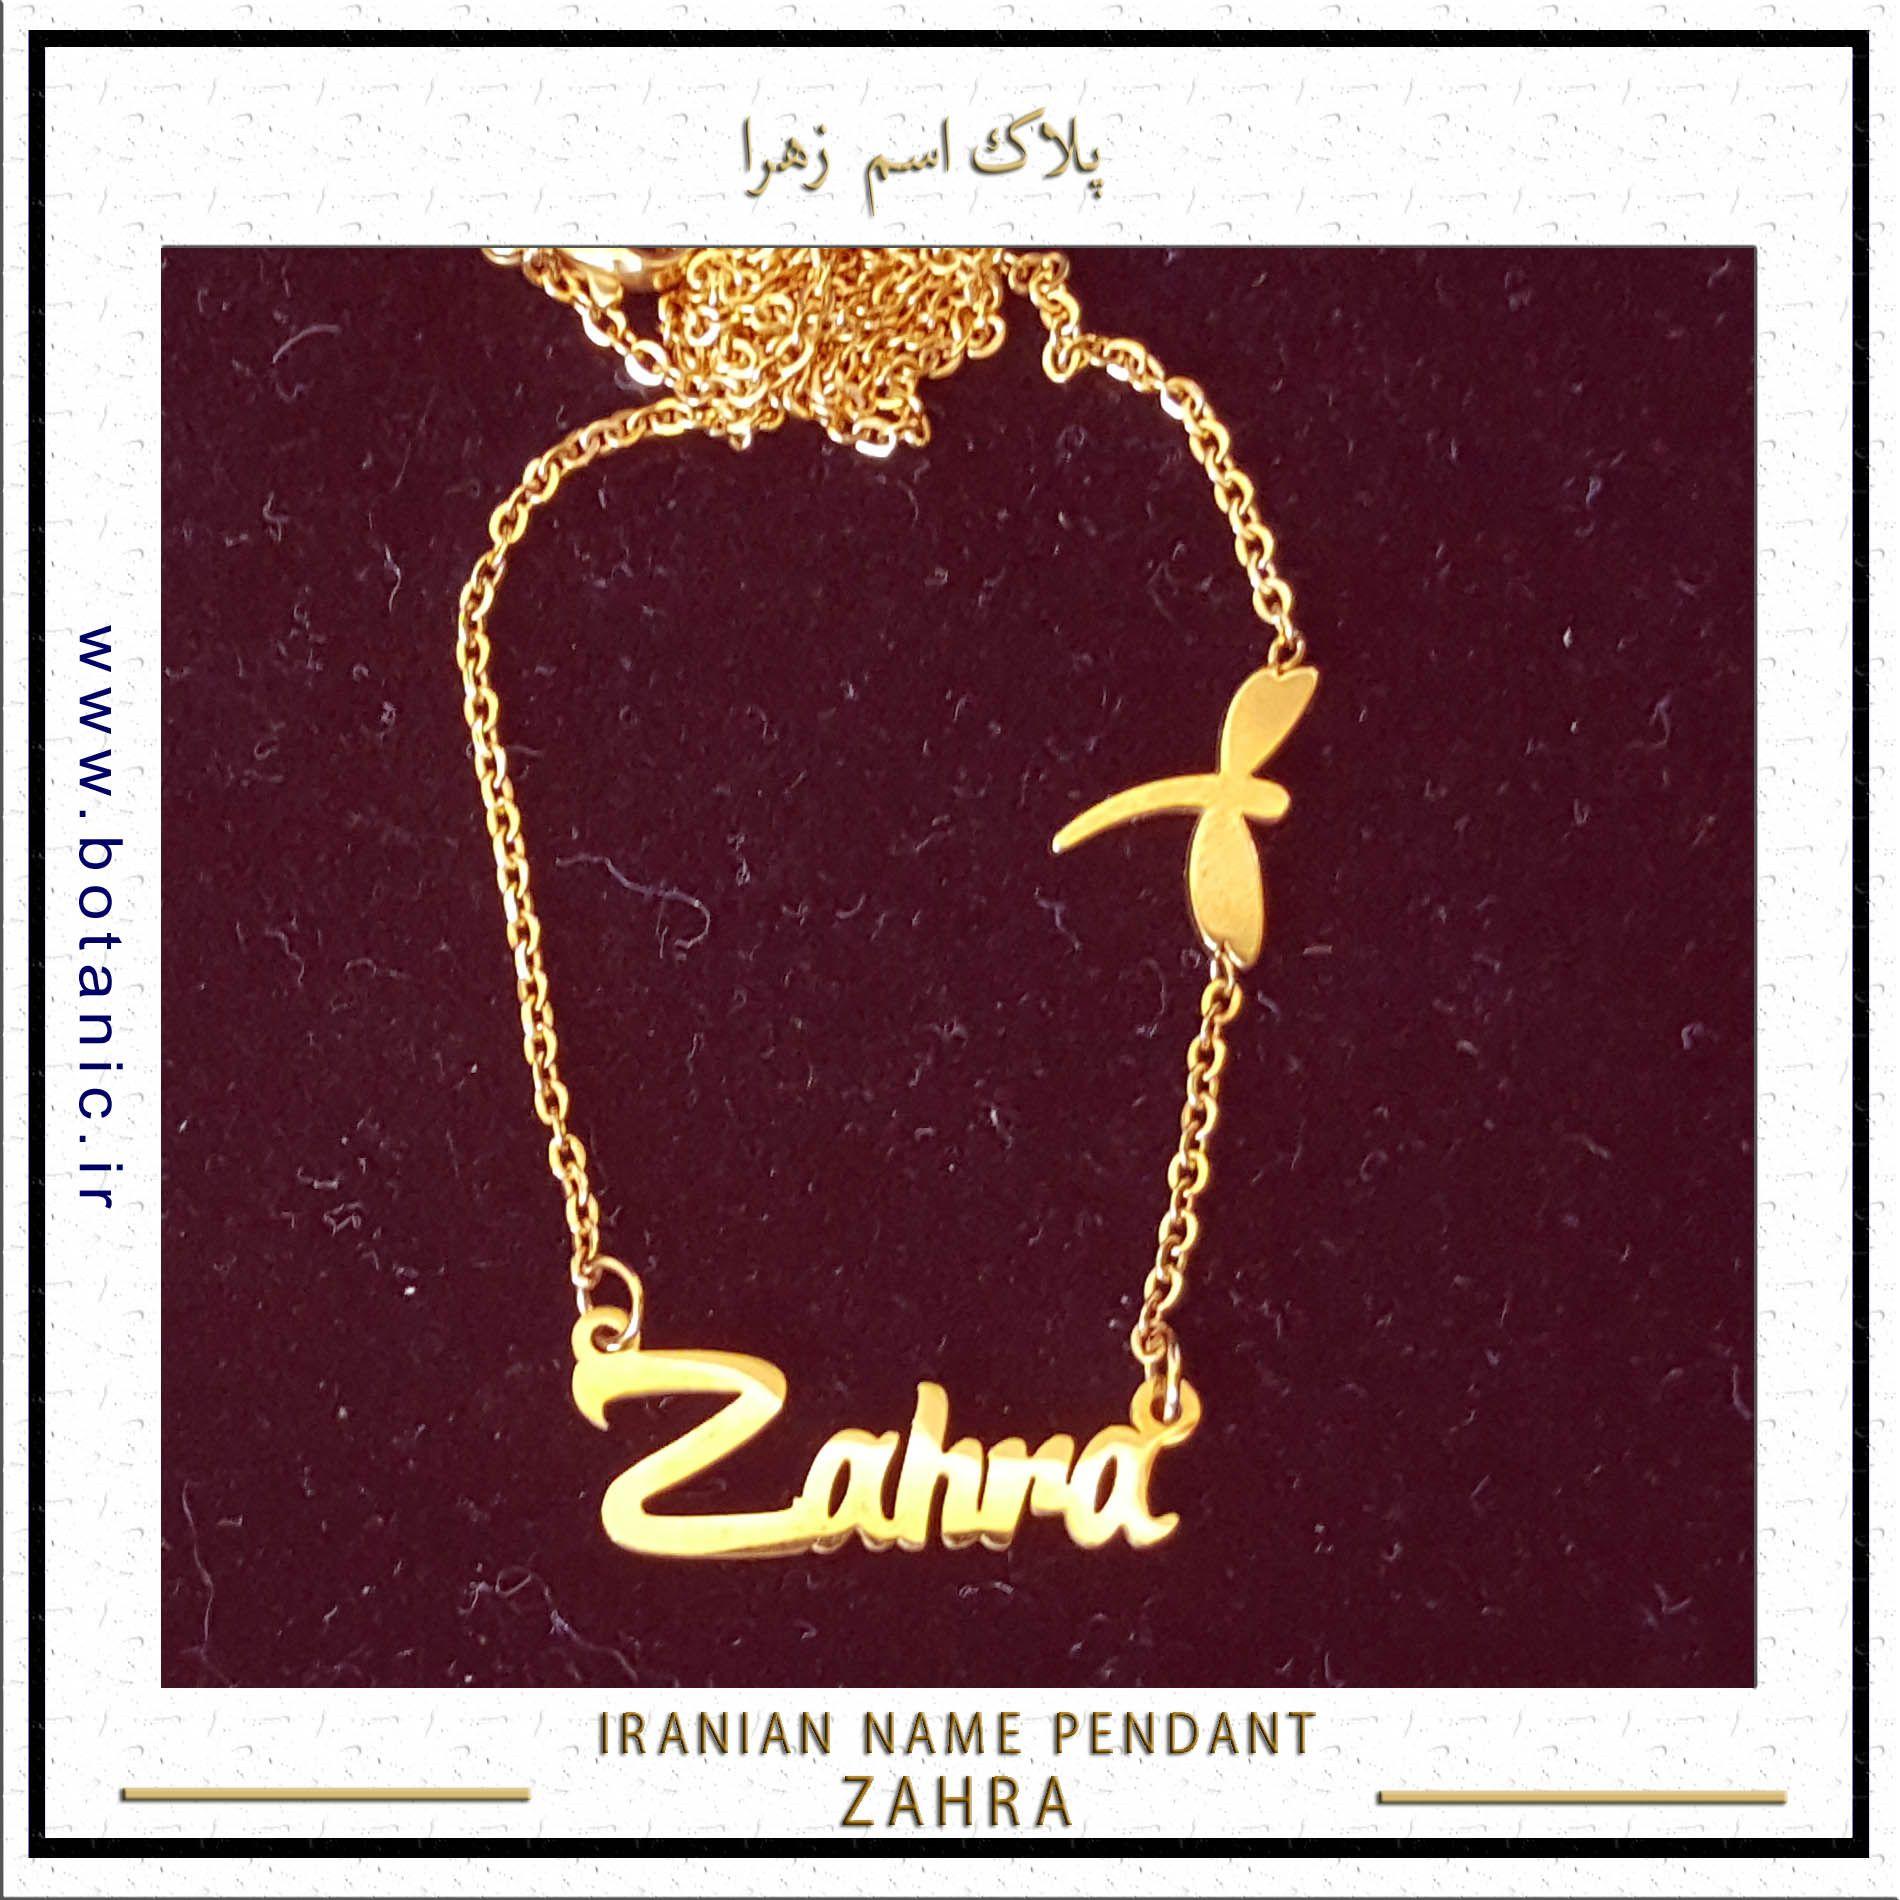 Most Popular Iranian Names 2 Zahra Stylish Alphabets Gold Jewelry Fashion Alphabet Images